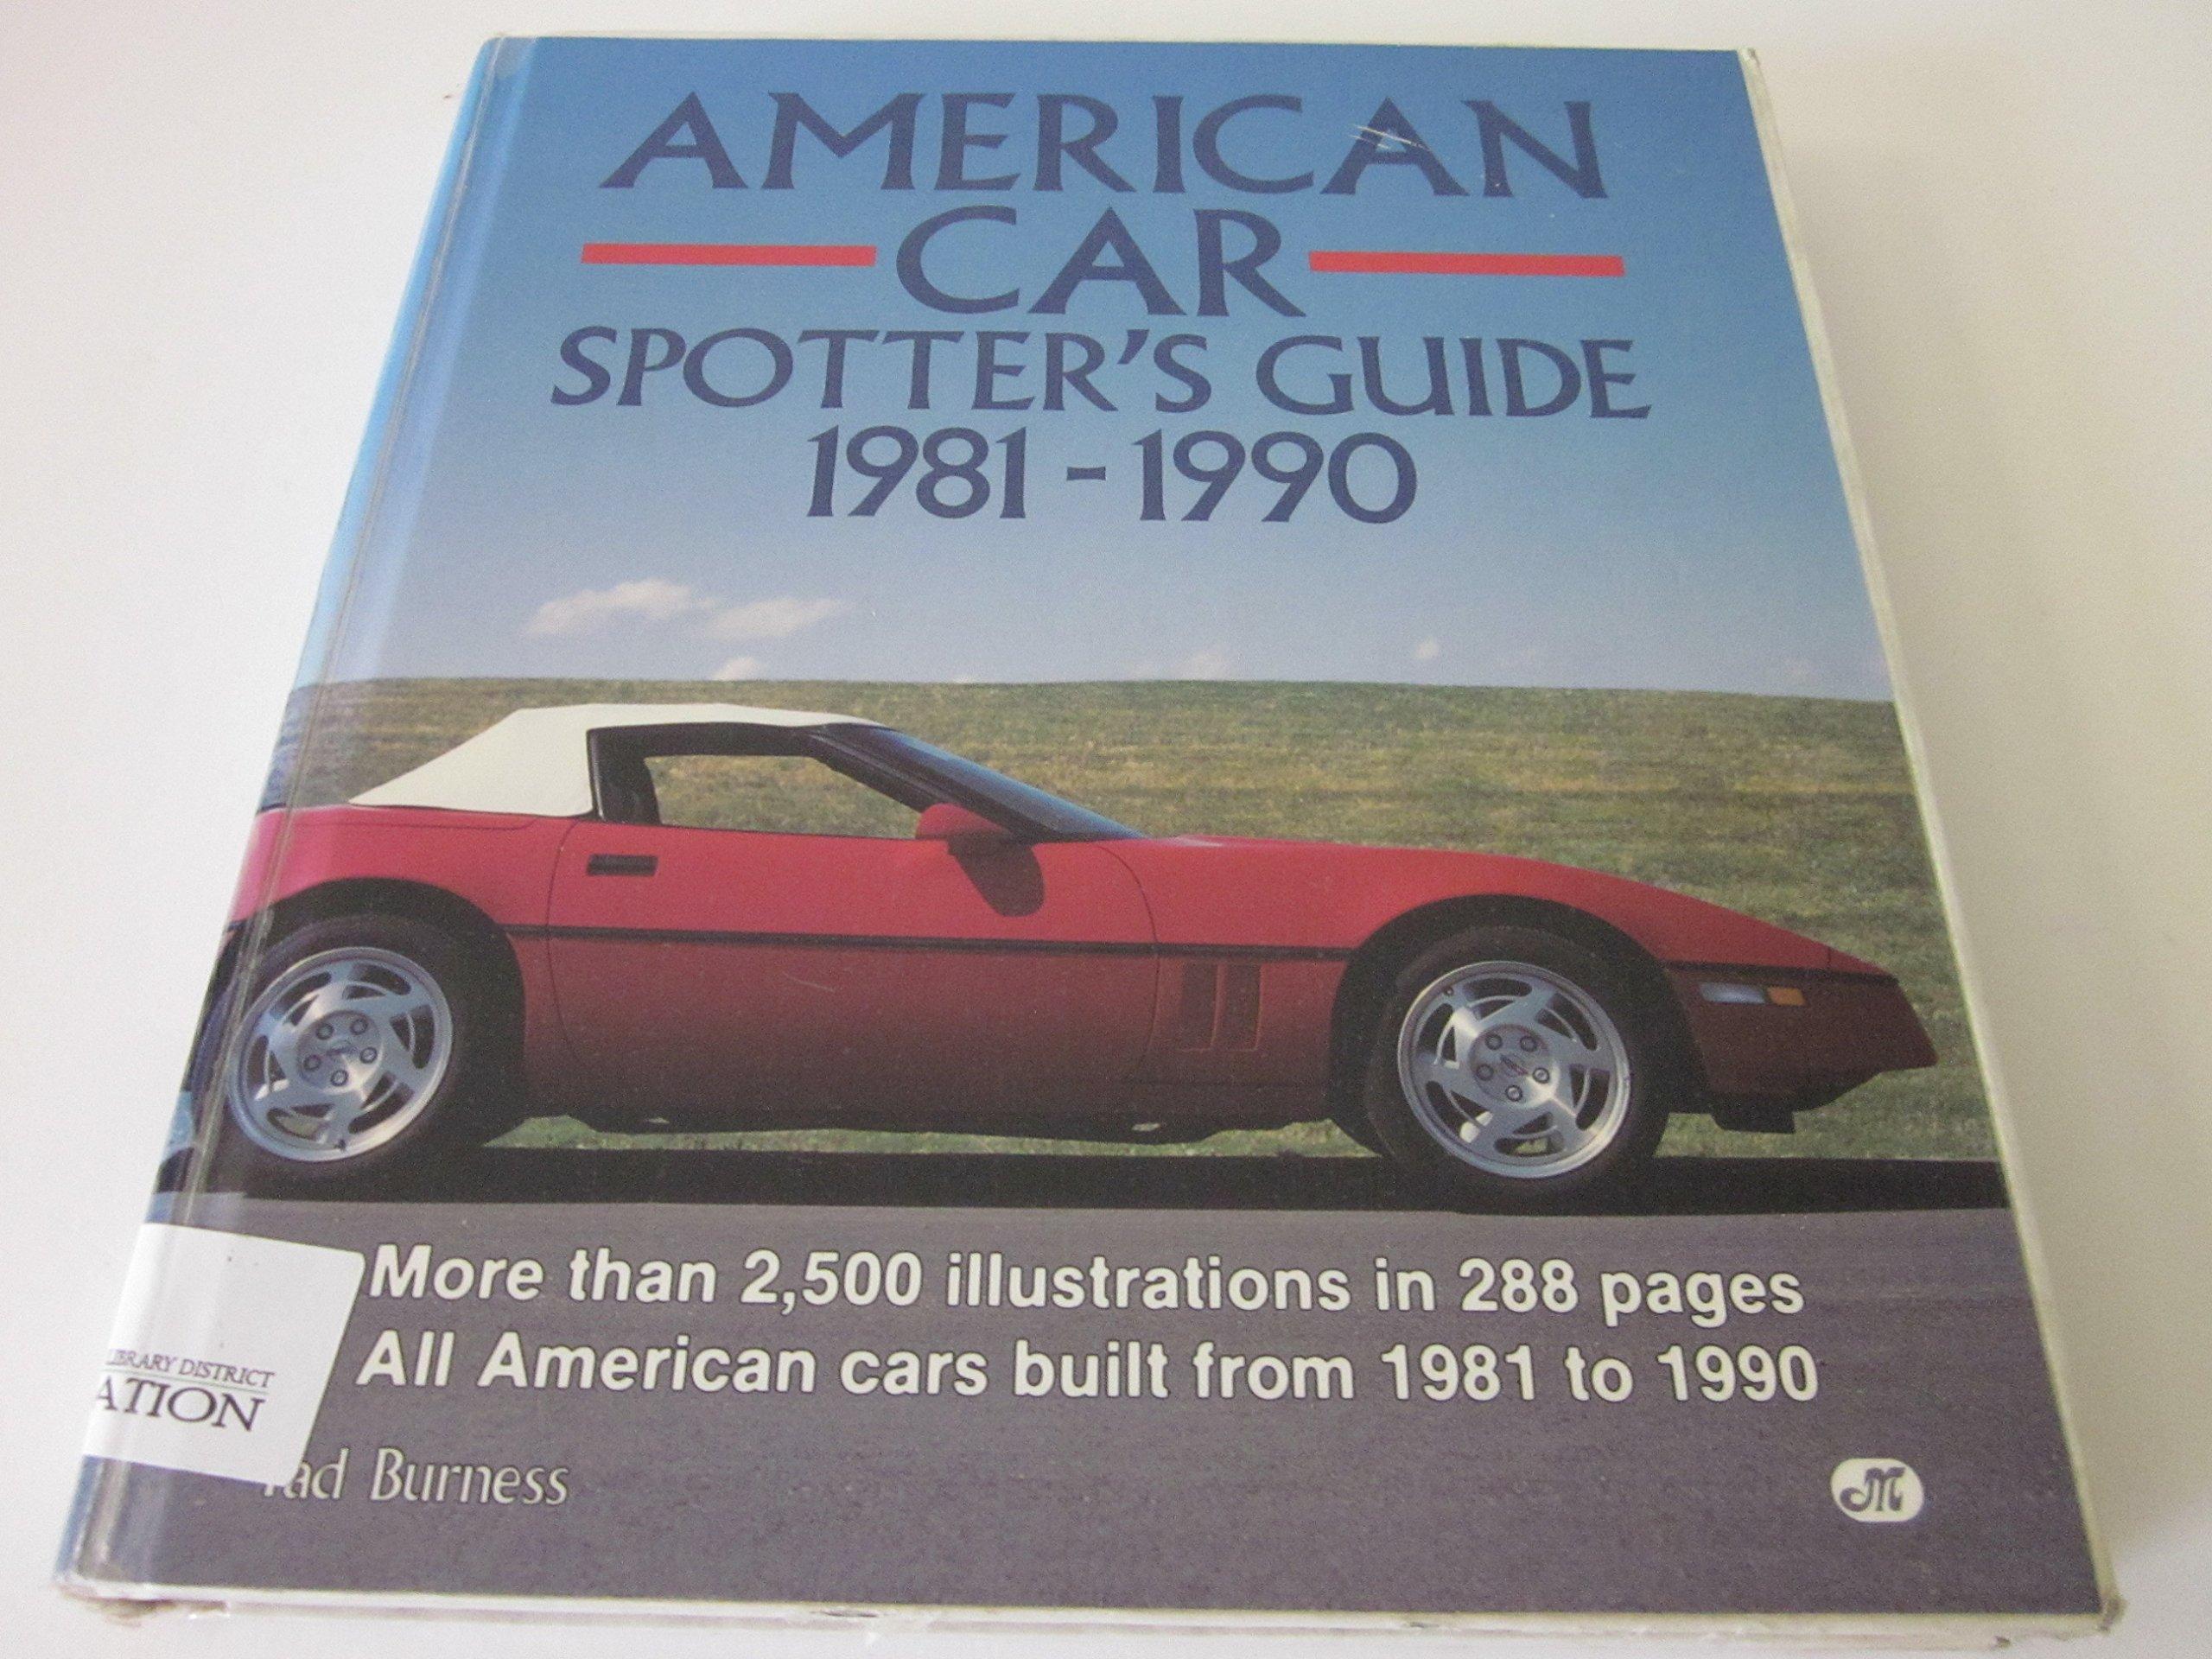 American Car Spotter\'s Guide, 1981-1990: Tad Burness: 9780879384289 ...